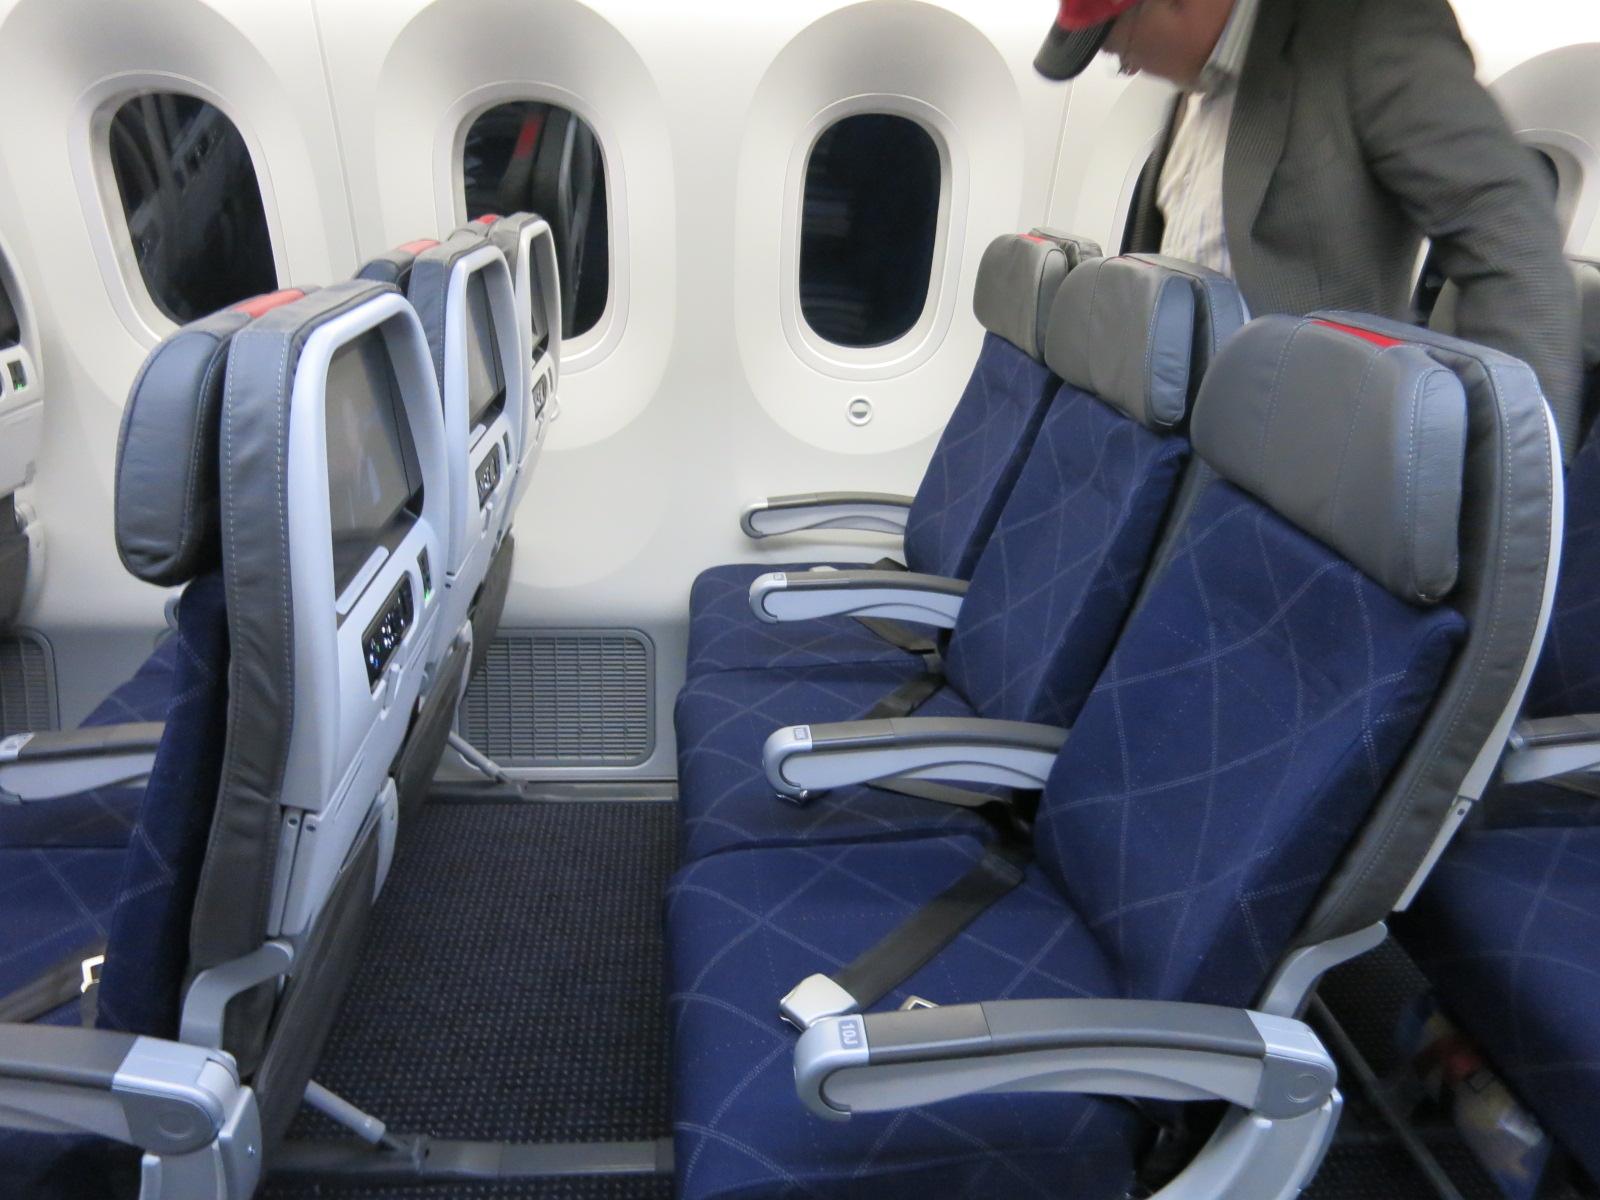 American Taking Away Free Premium Coach Seats From Full Fare